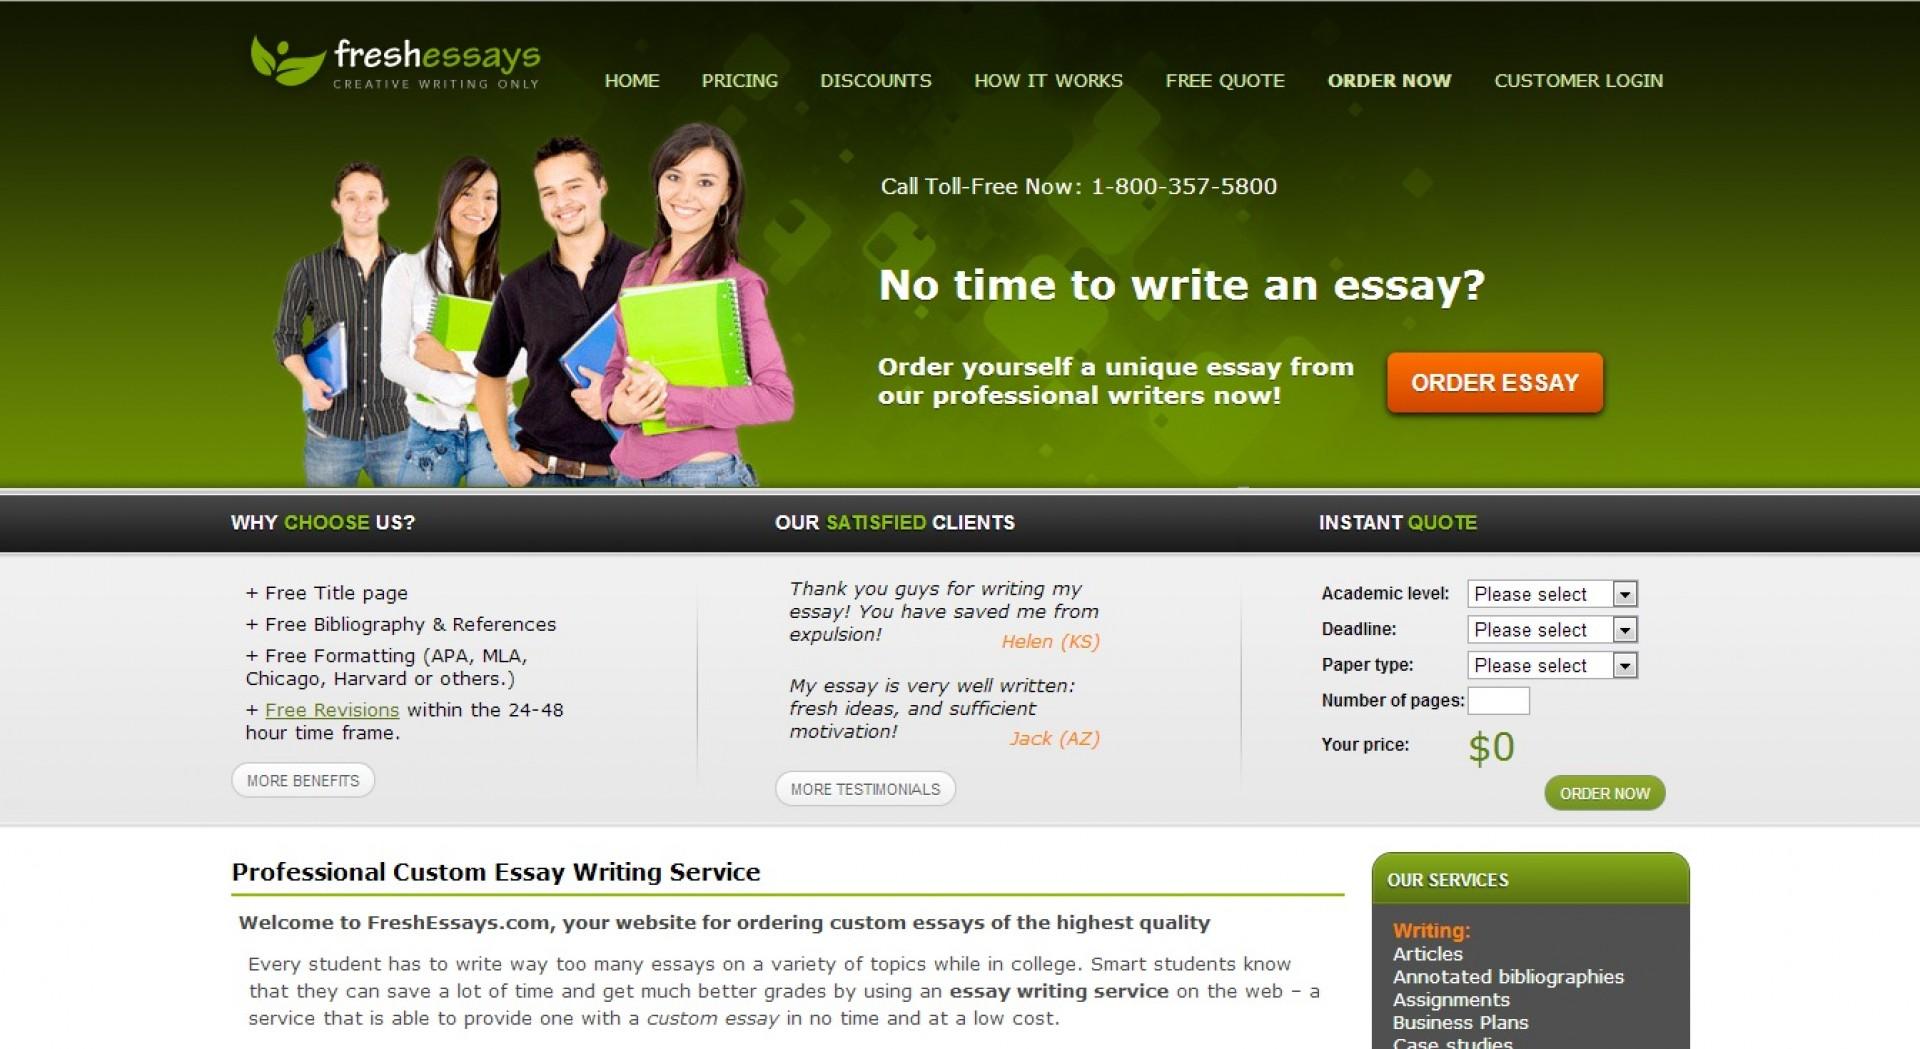 003 Essay Writing Service Reviews Review Who Writes Best Custom Essays Freshe Software Singular 2017 Top 1920